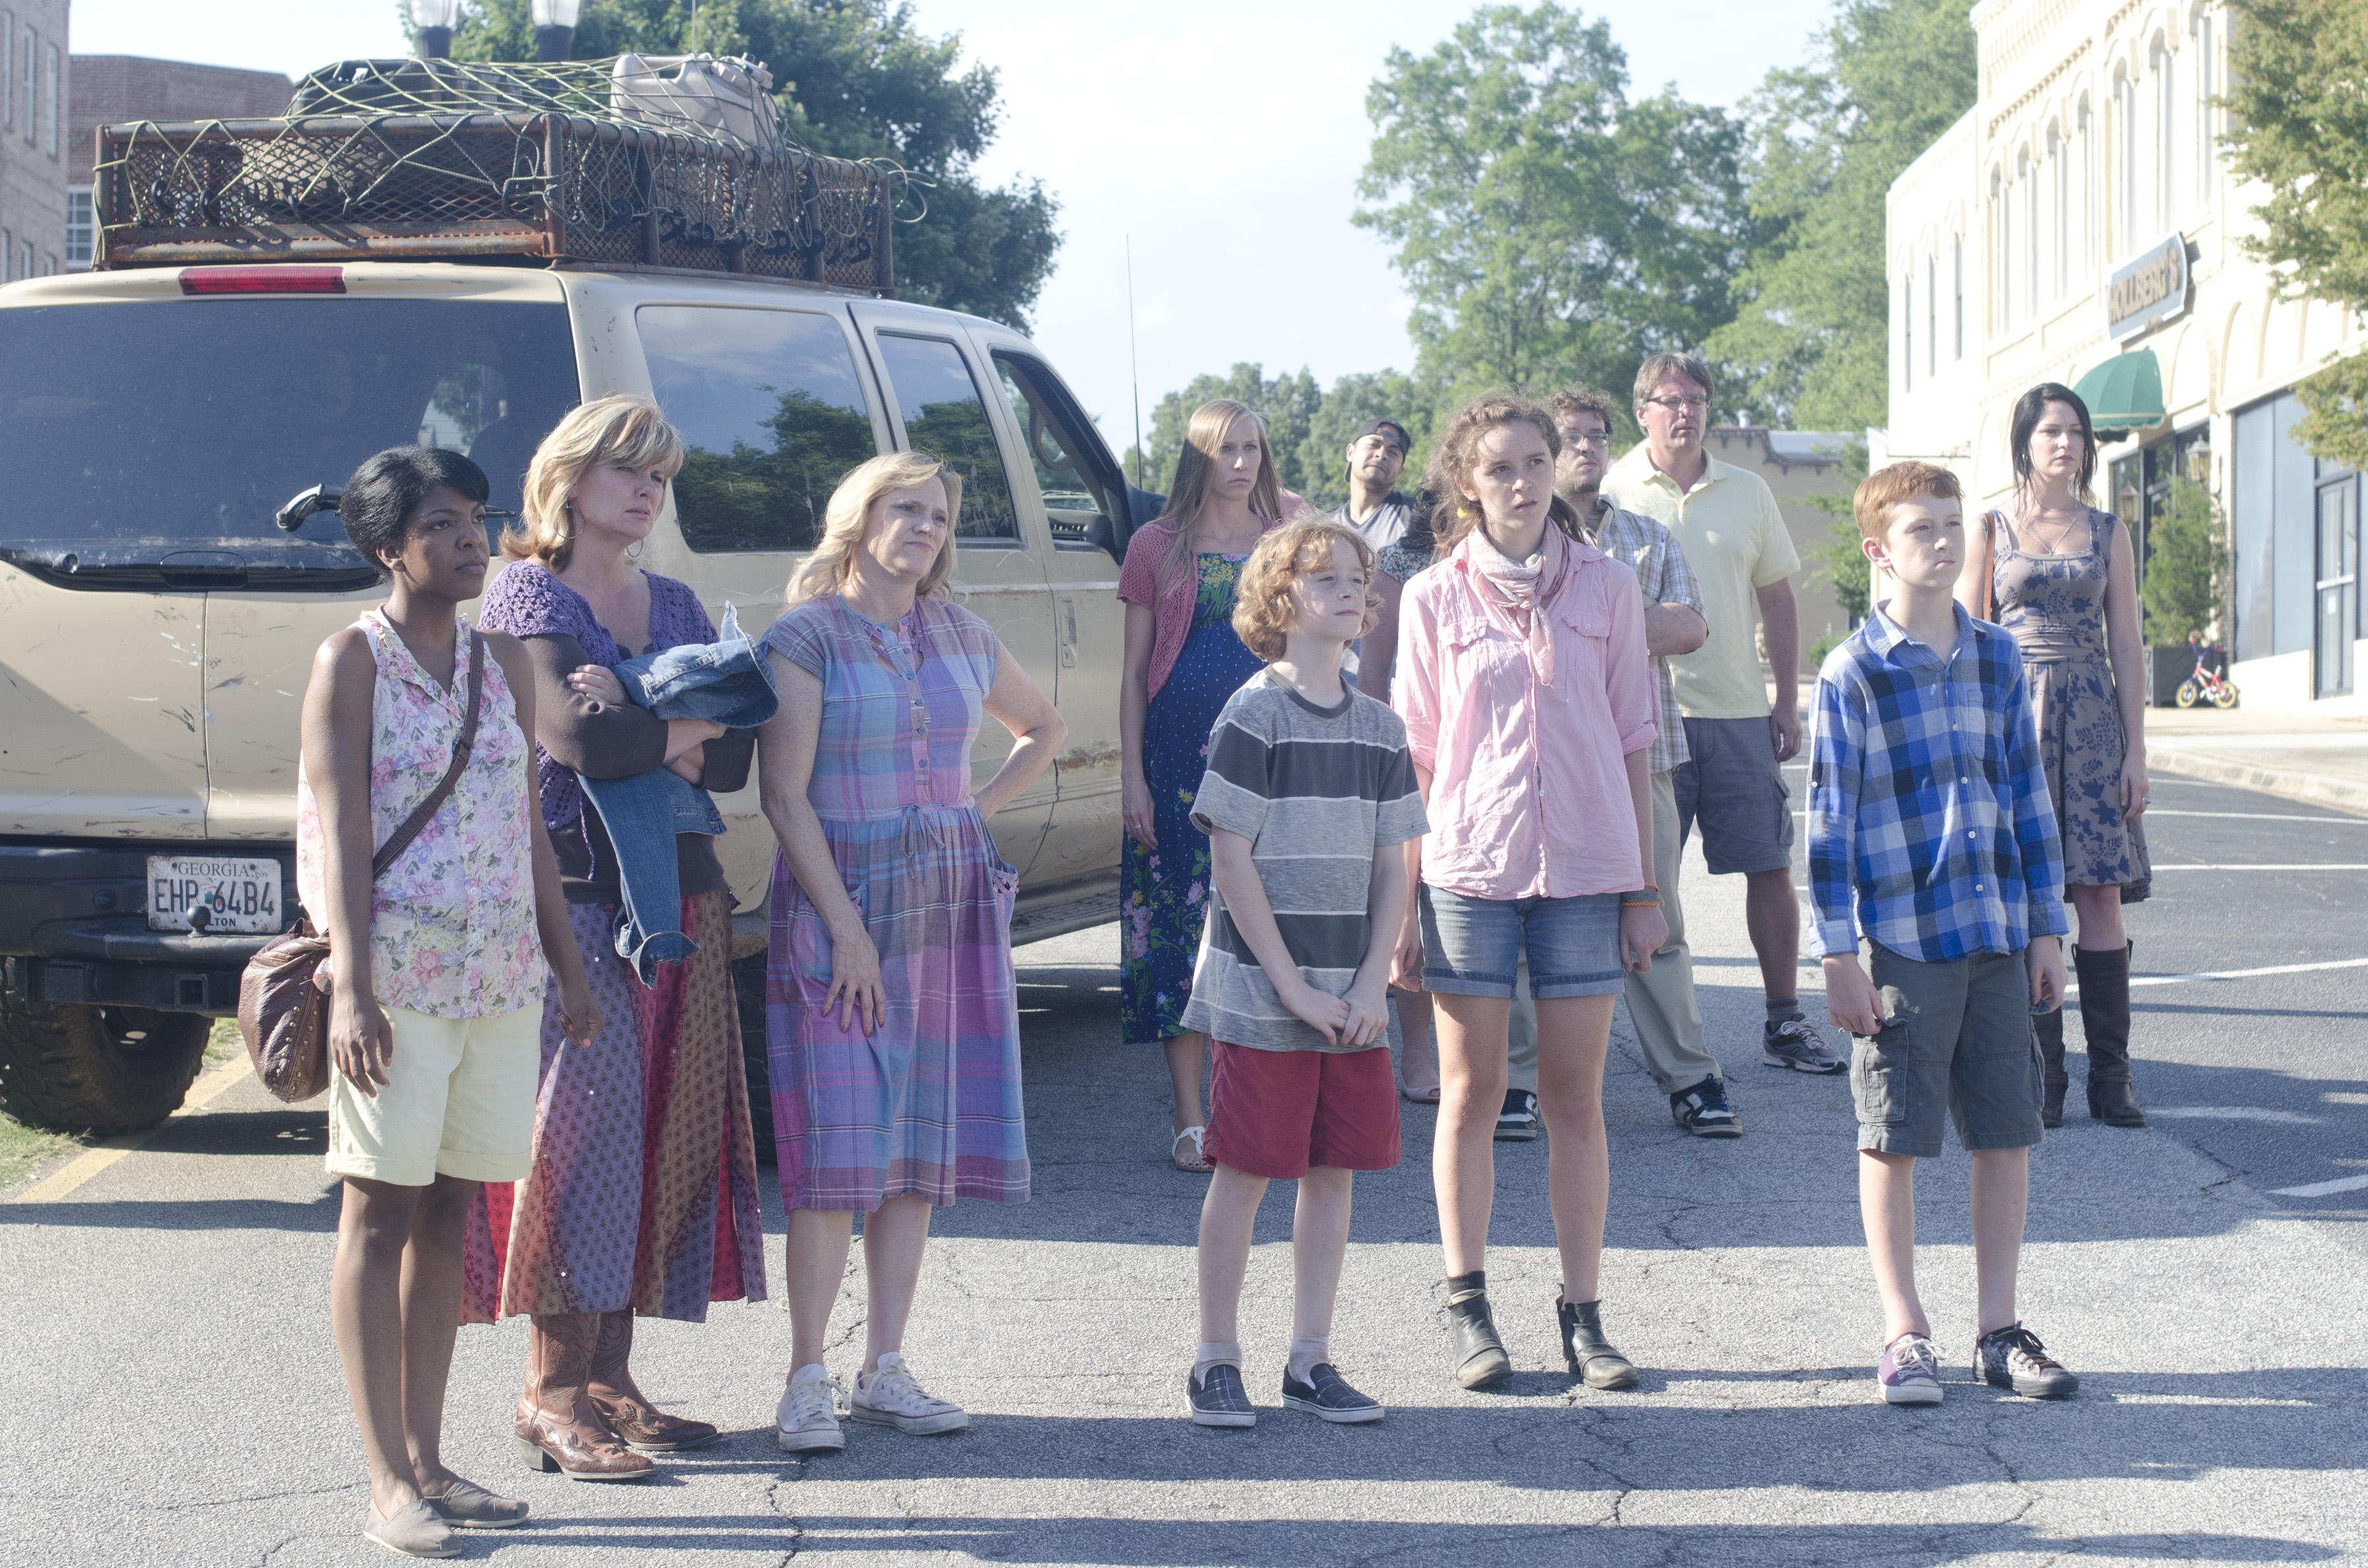 File:Woodbury survivors (Walk With Me).jpg